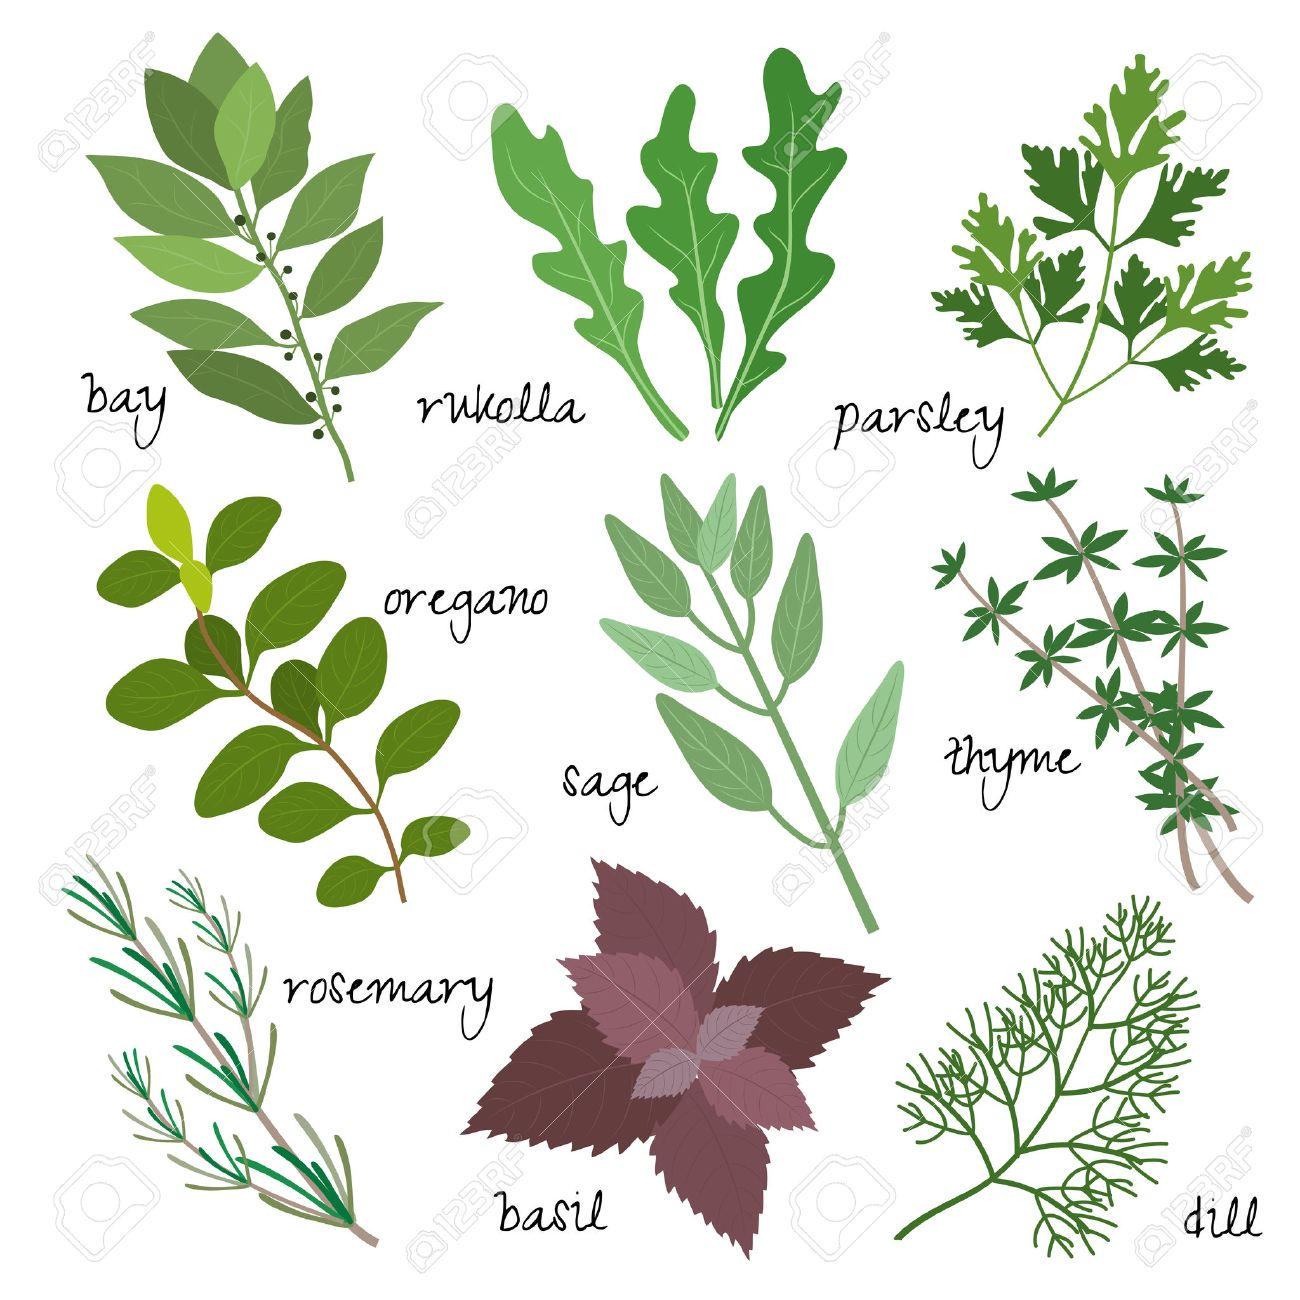 Healing, Medicinal And Fragrant Herbs Royalty Free Cliparts ...